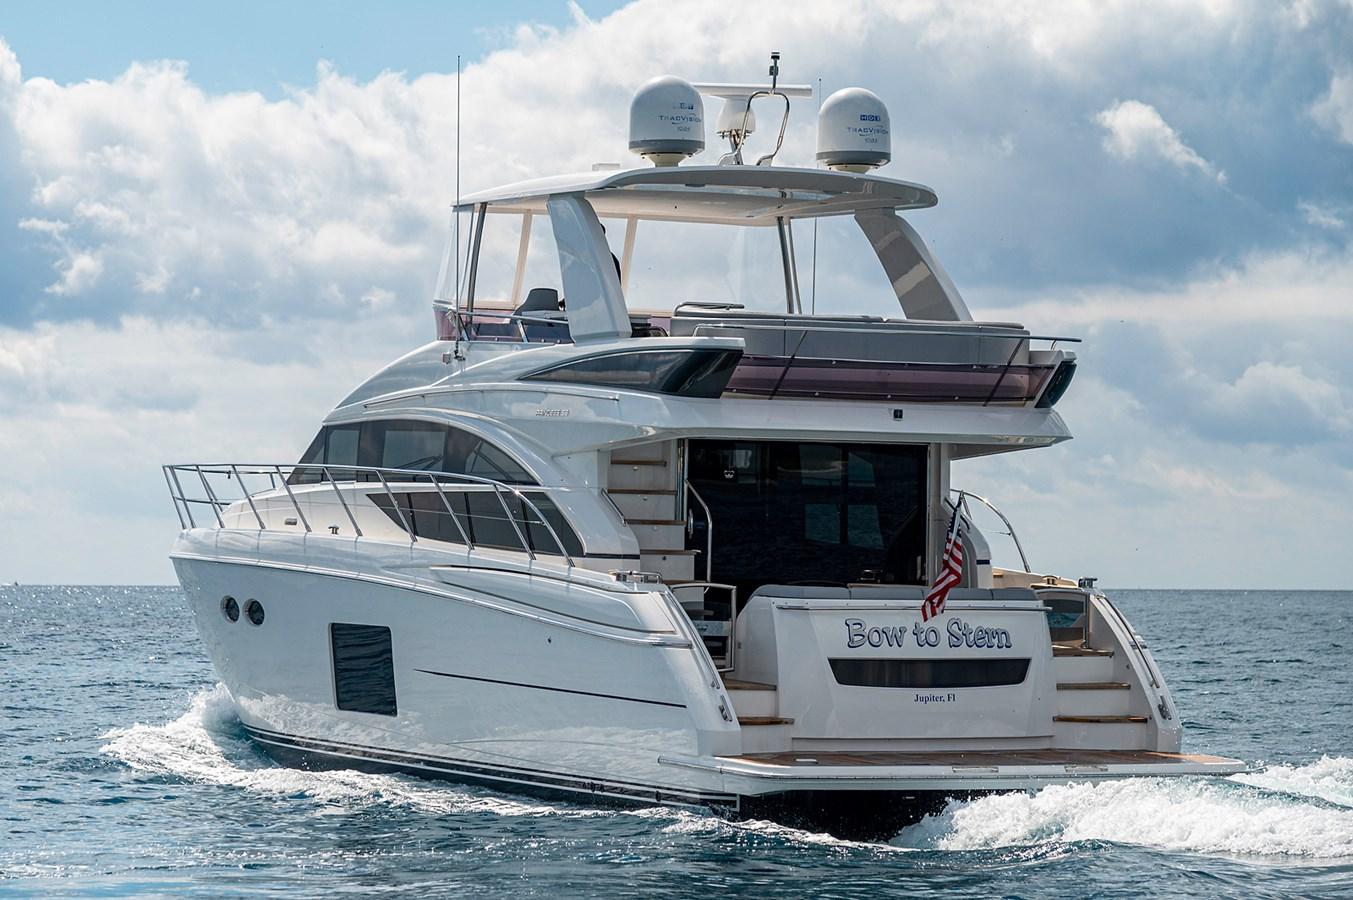 Bow To Stern_Running1 2015 PRINCESS YACHTS 56 Motor Yacht 2932843